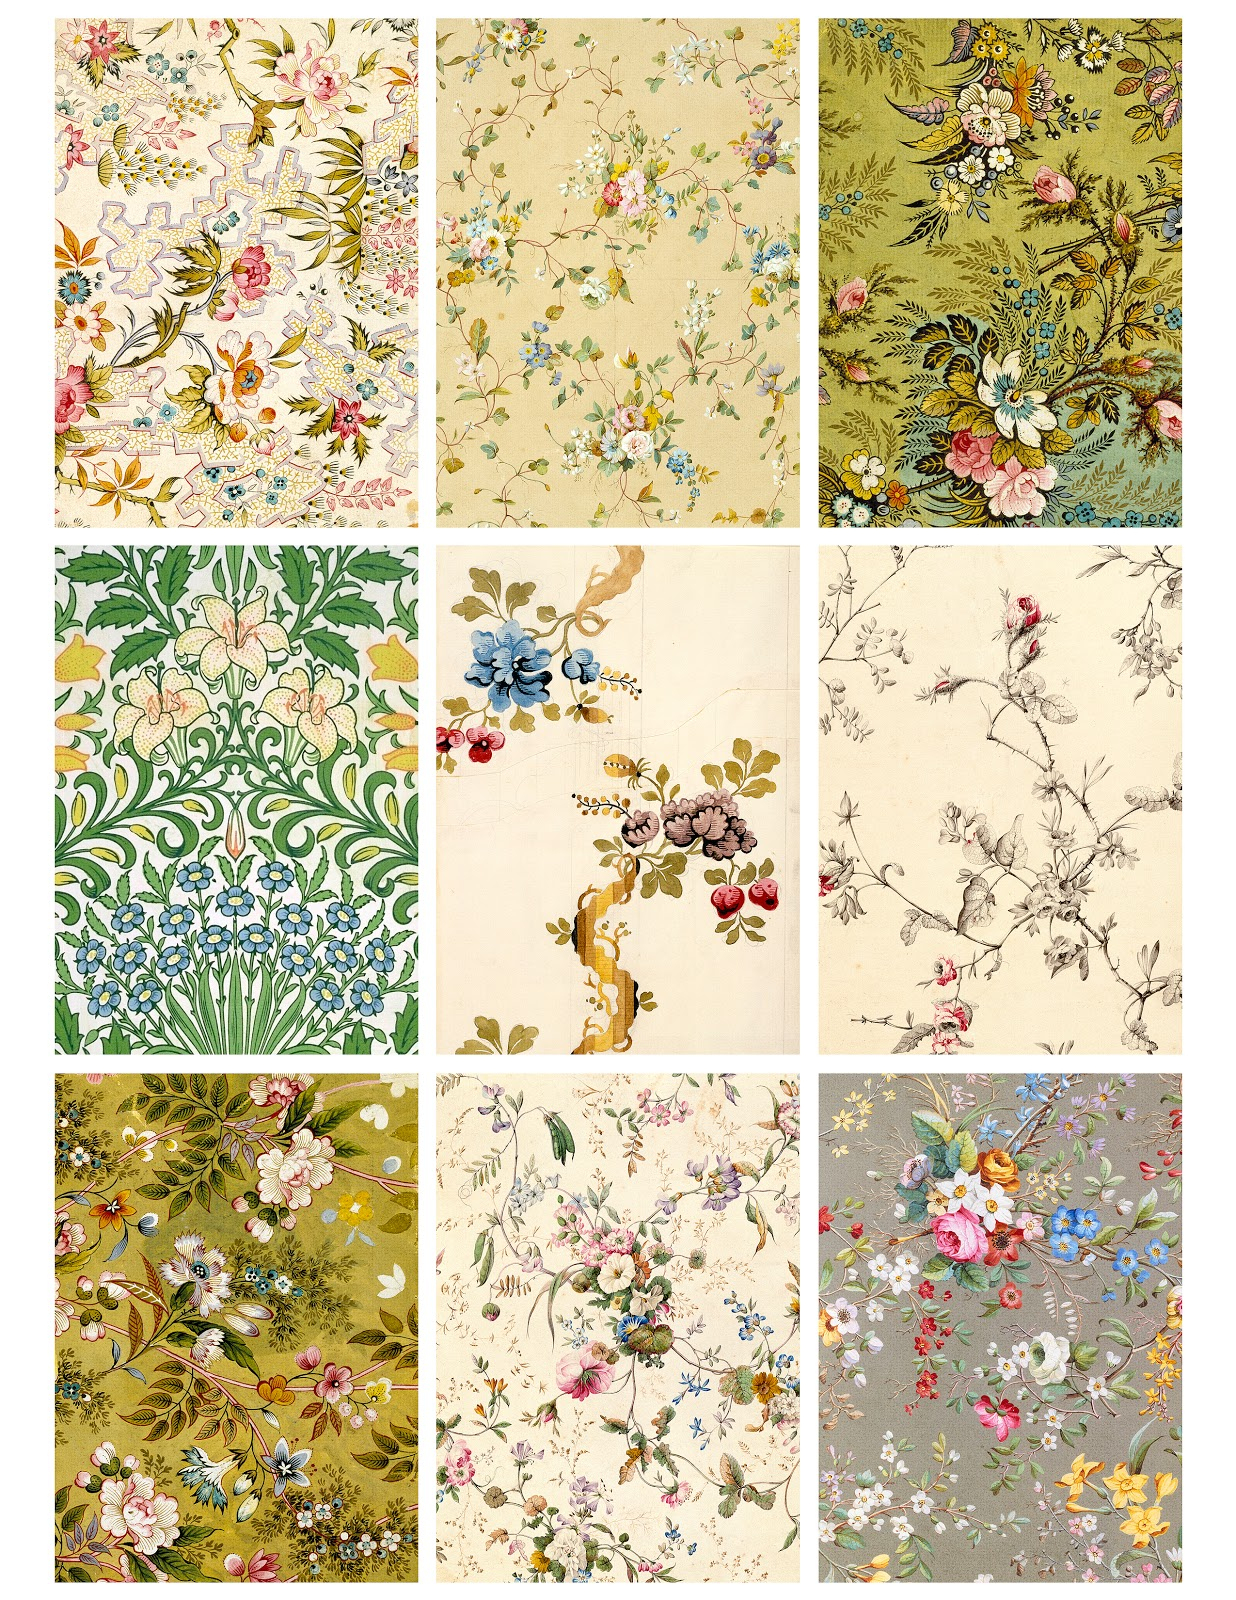 Printable Wallpaper Patterns - Wallpapersafari - Free Printable Wallpaper Patterns